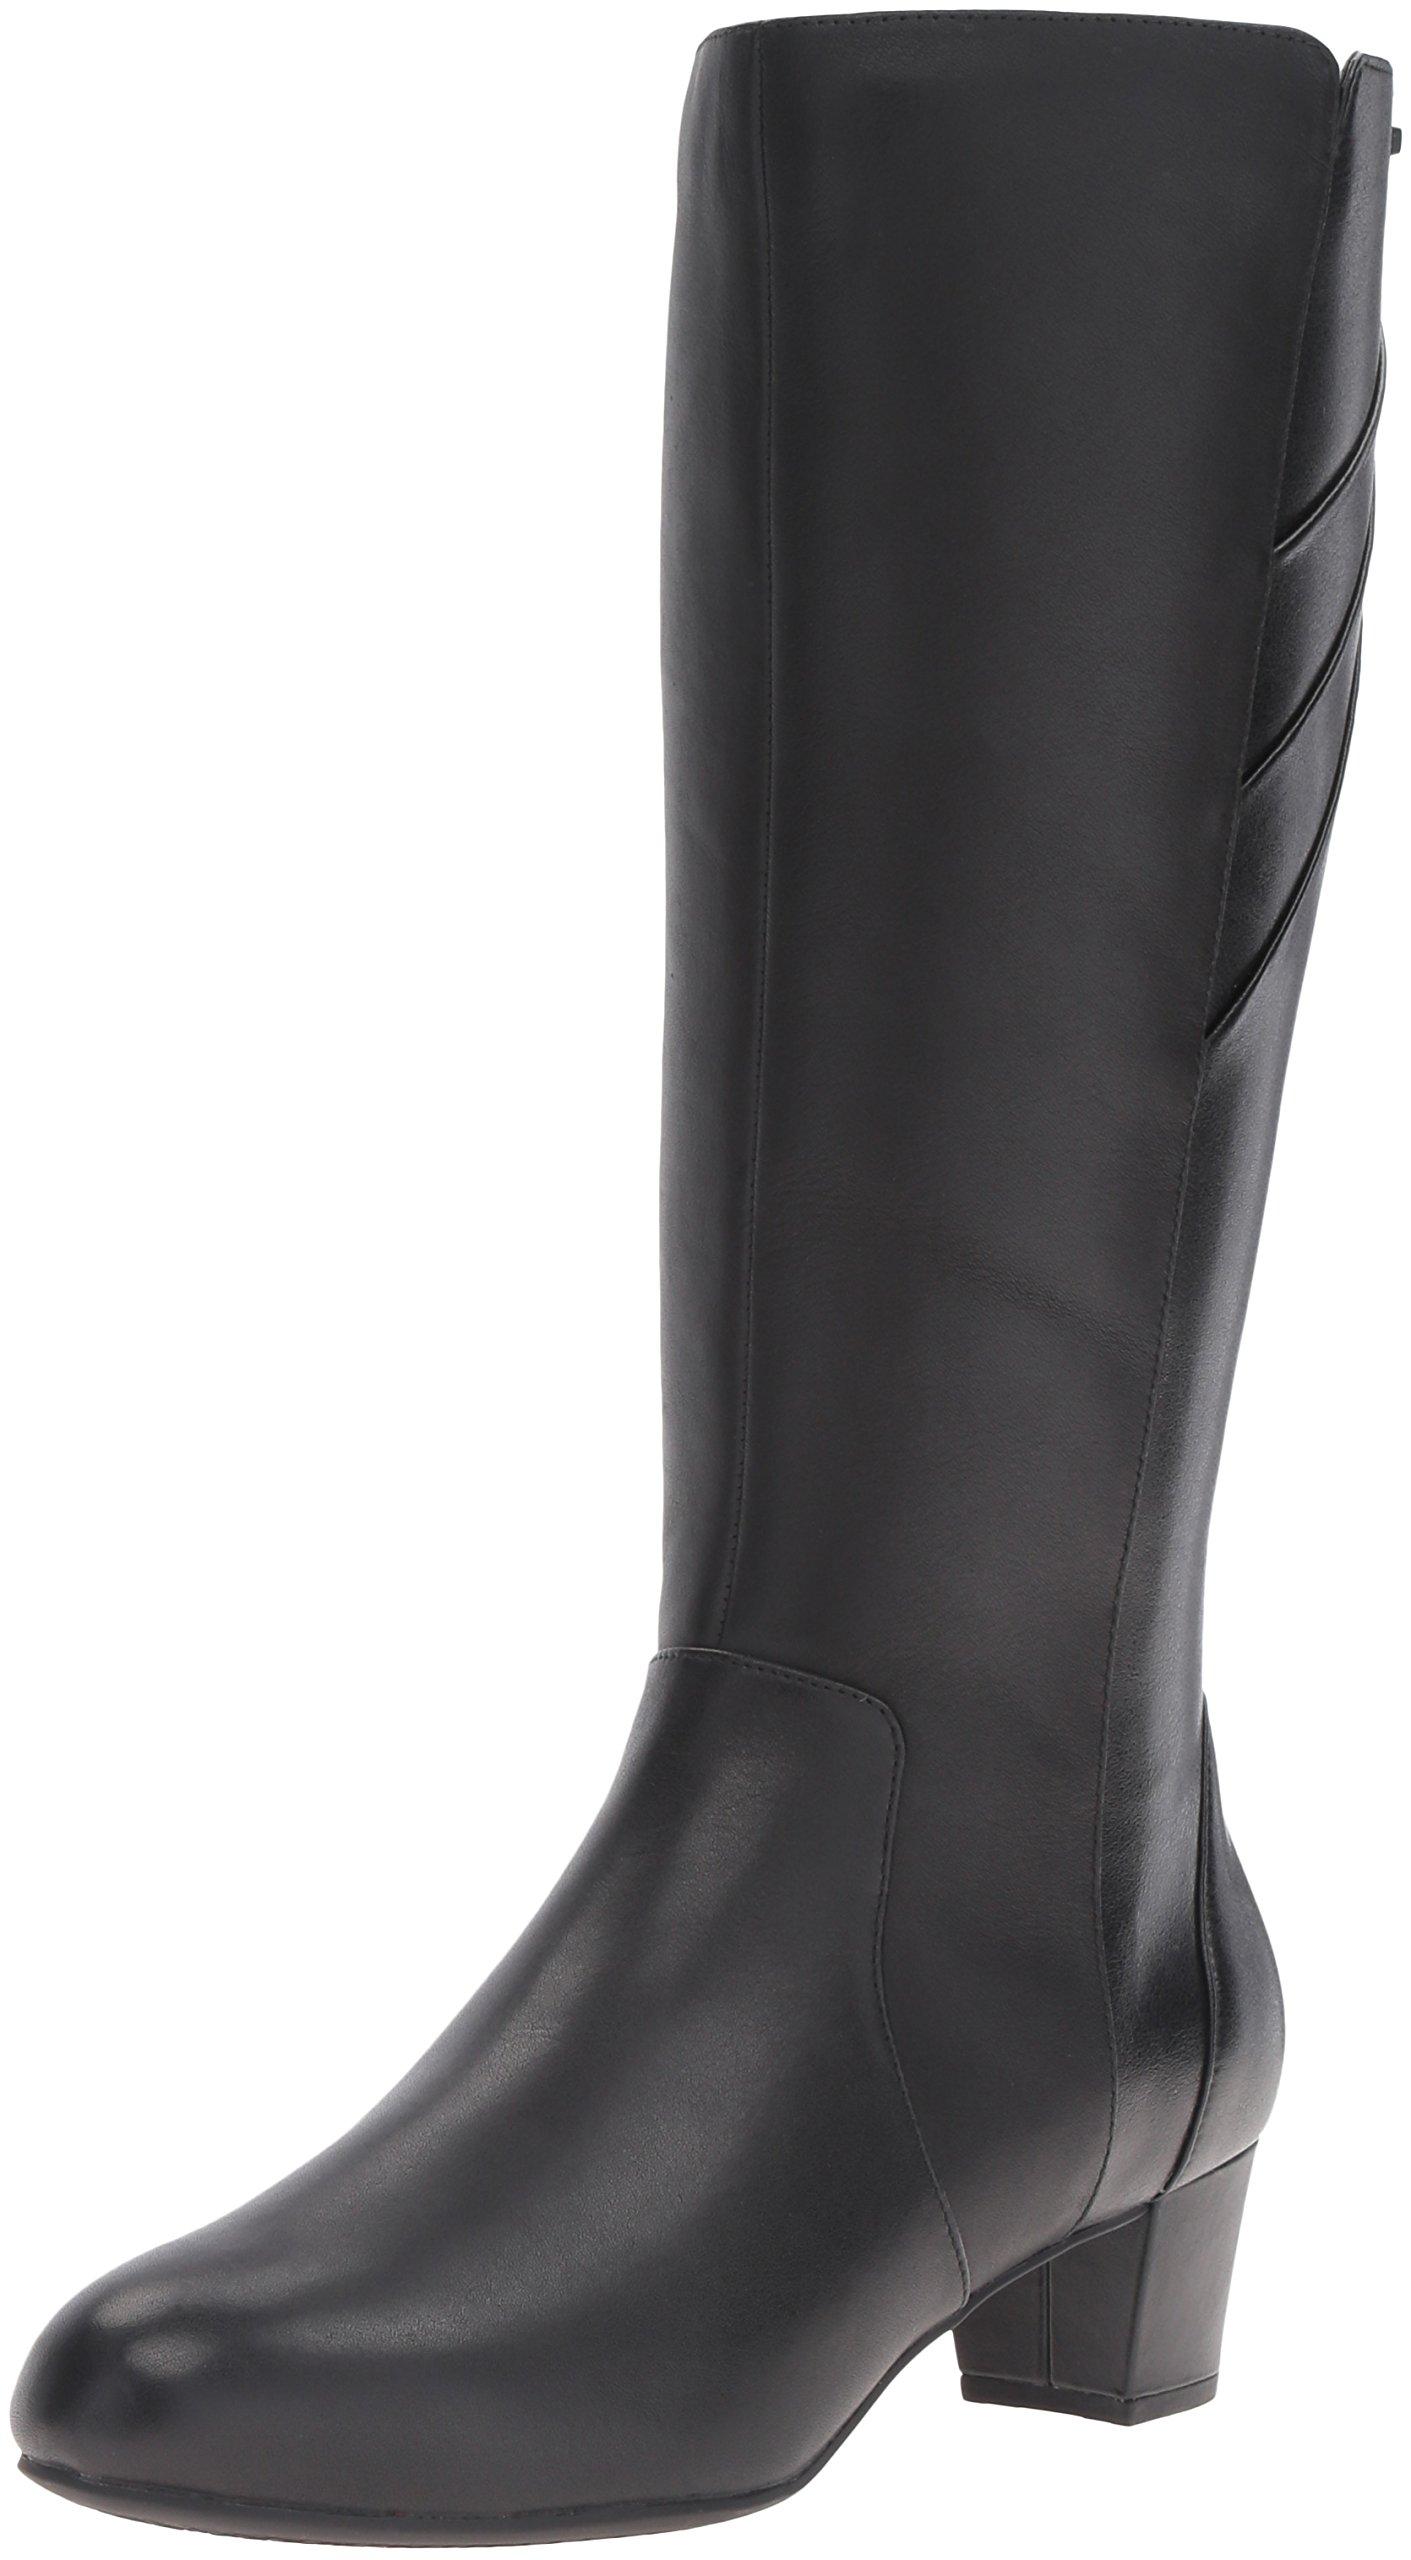 Rockport Women's Total Motion Cresenthia Riding Boot, Black Waterproof, 8 M (B)